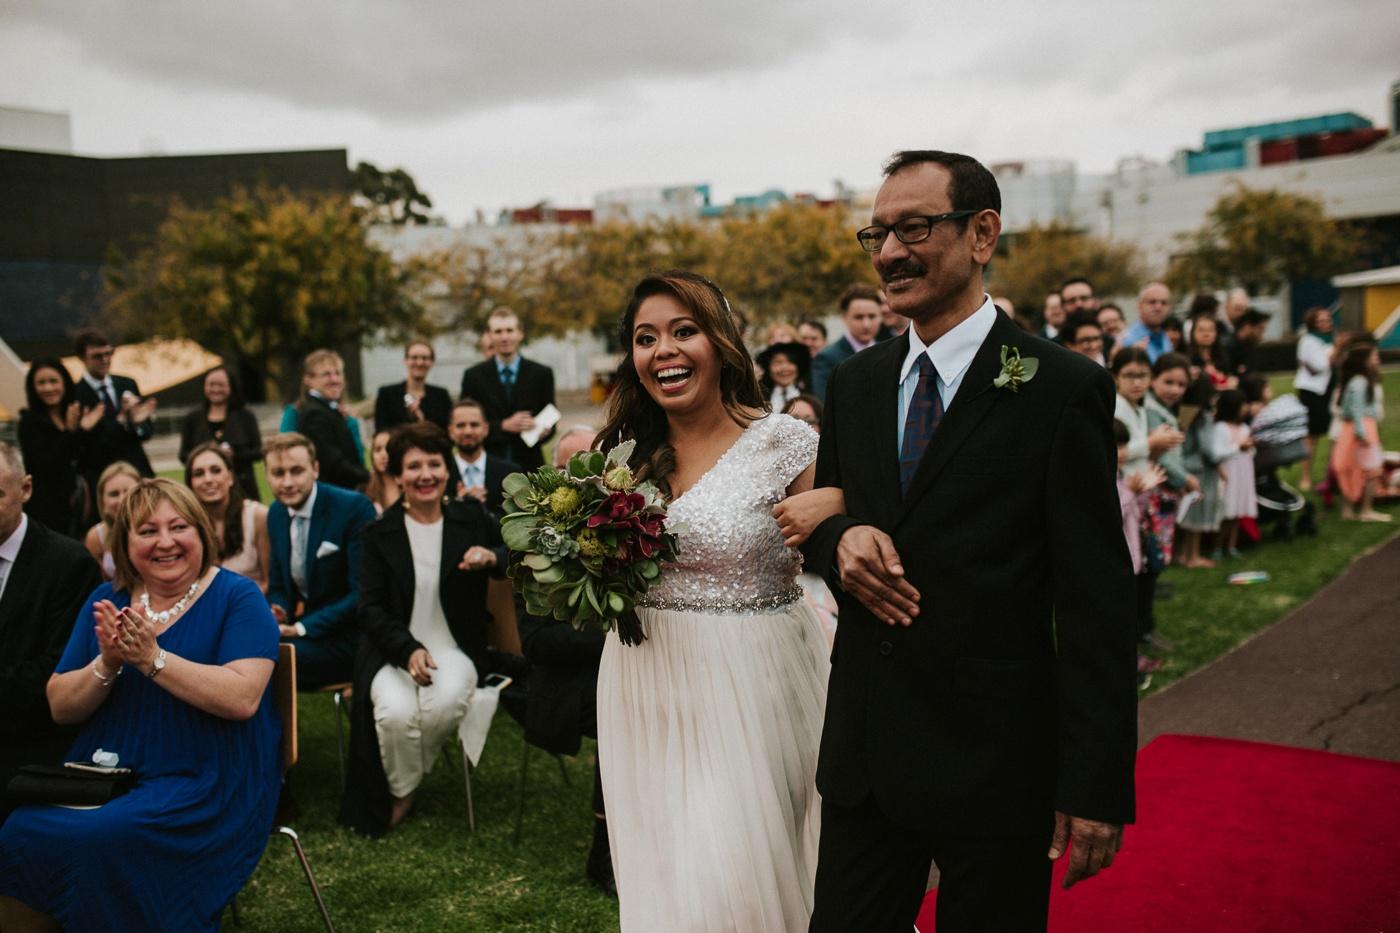 anitadaniel_melbourne-scienceworks-relaxed-fun-geek-wedding_melbourne-candid-wedding-photography_39